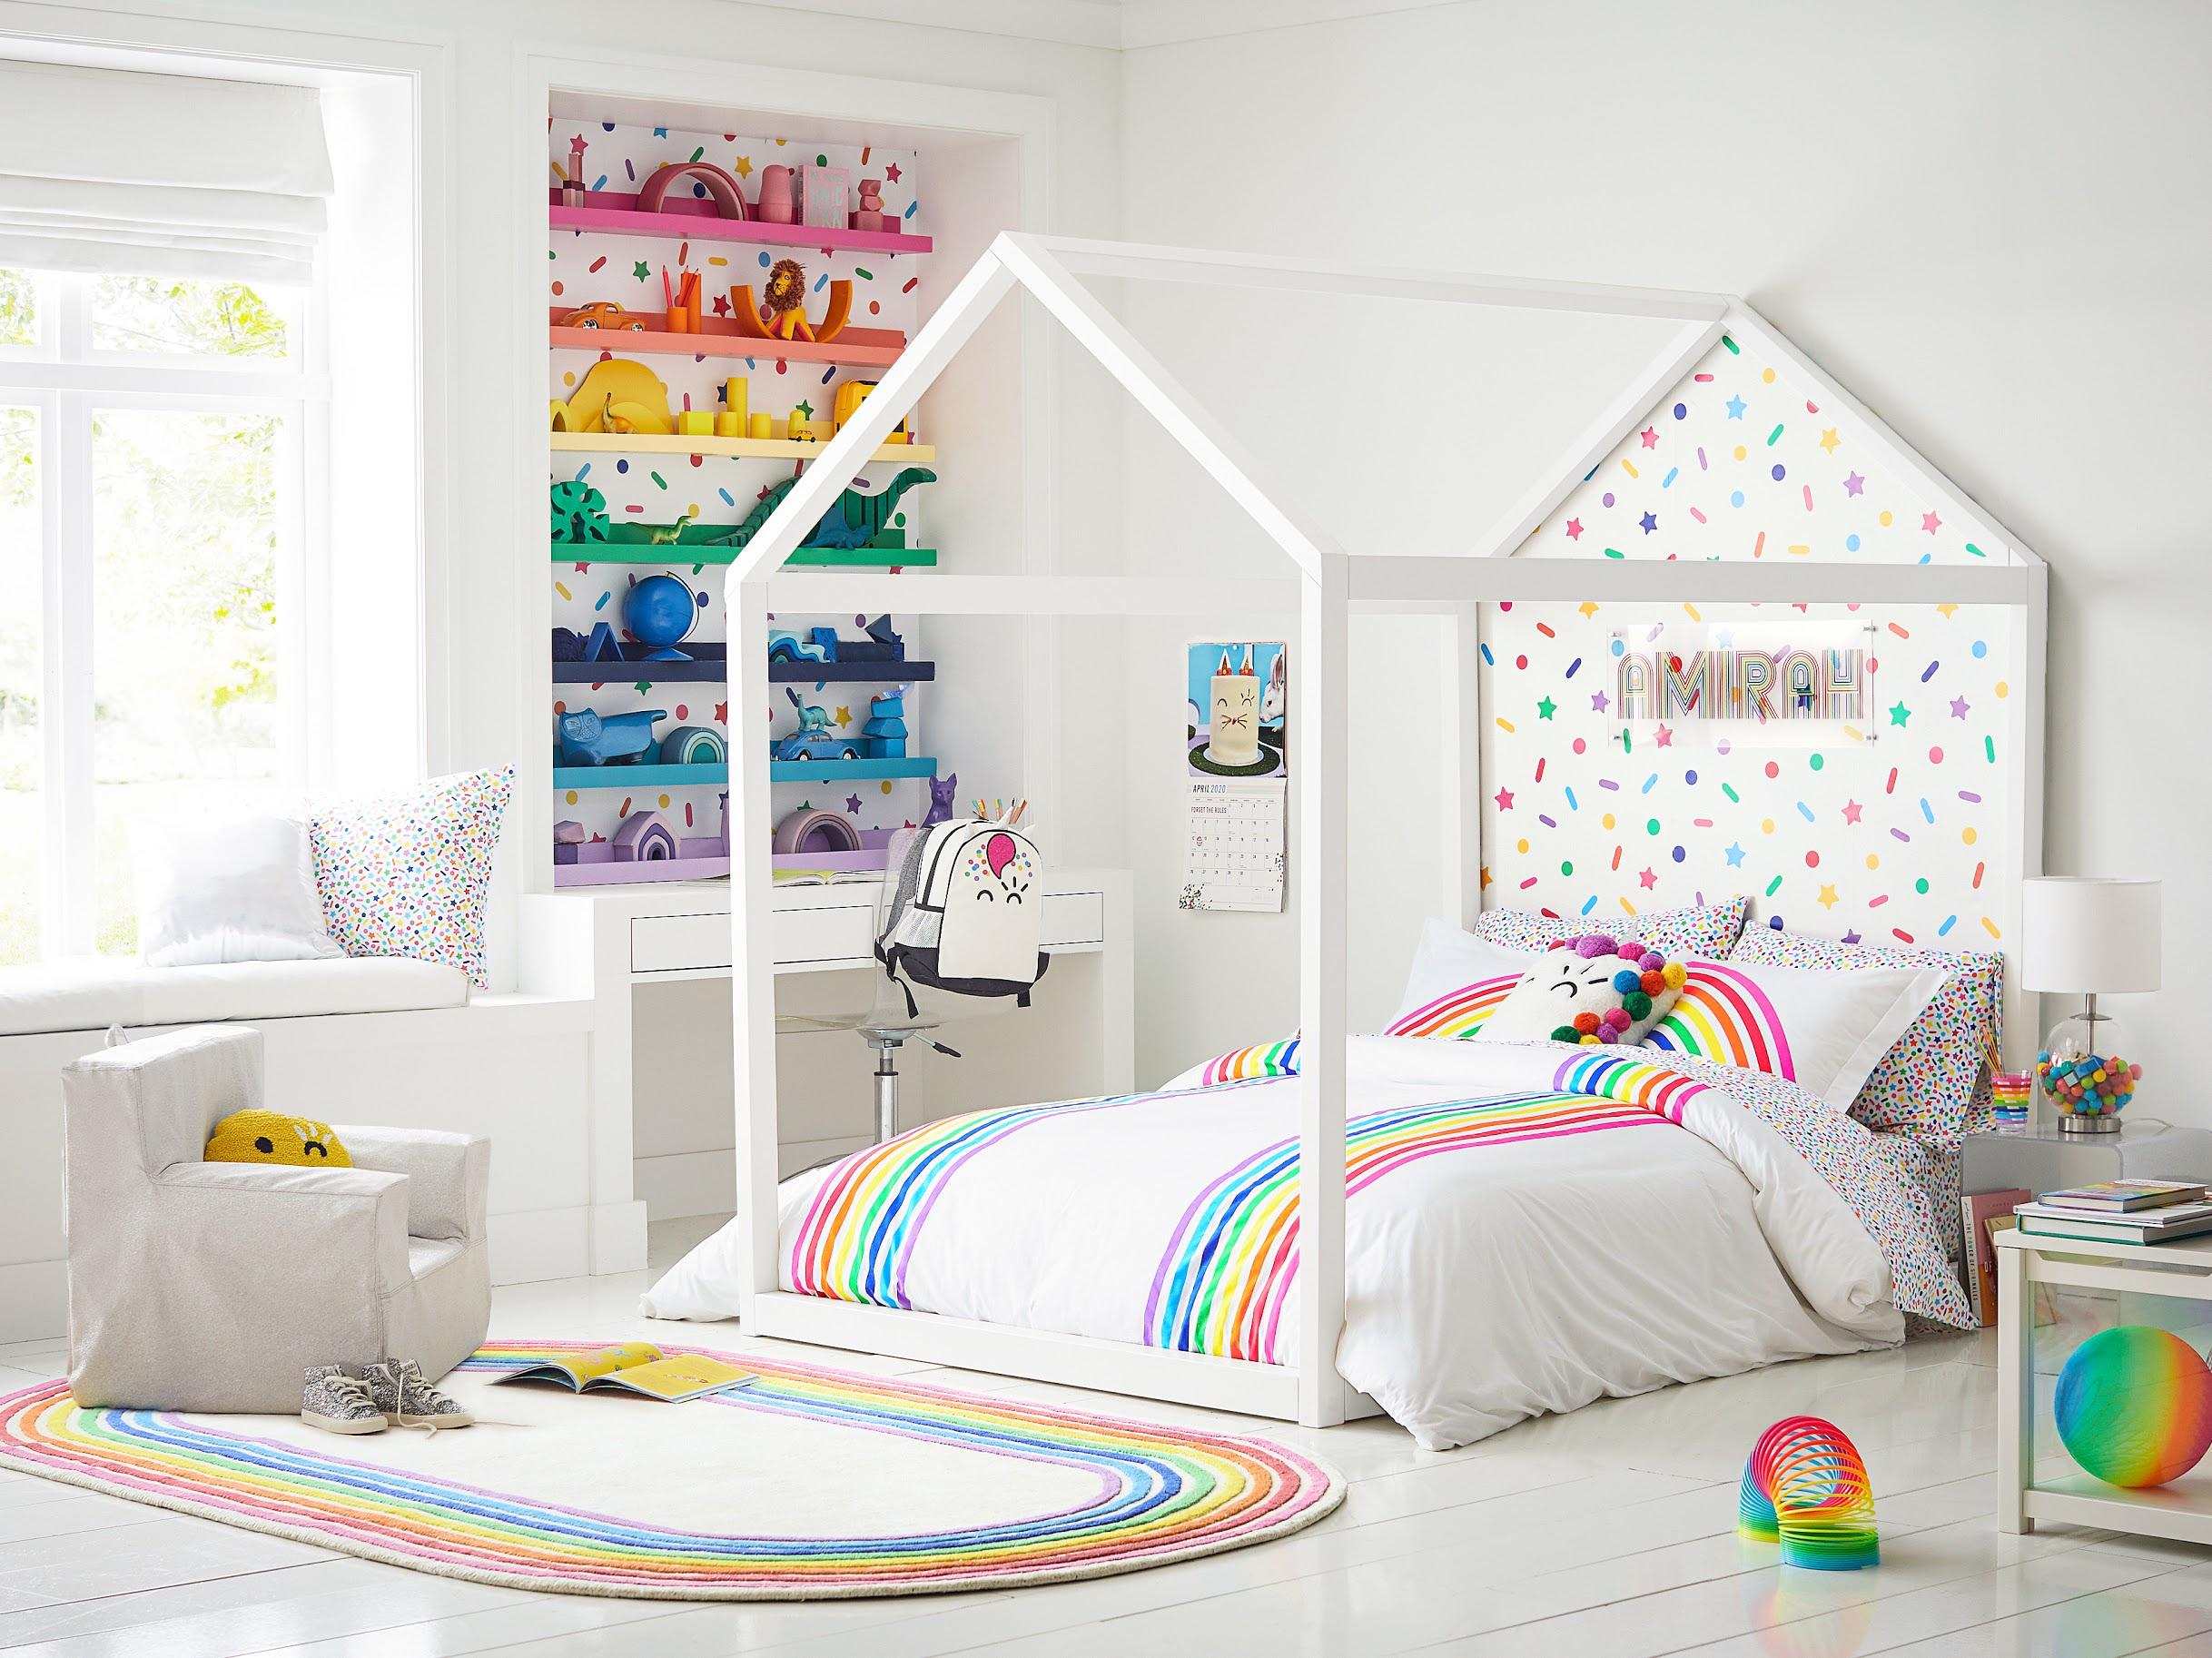 FS x PBK bedroom